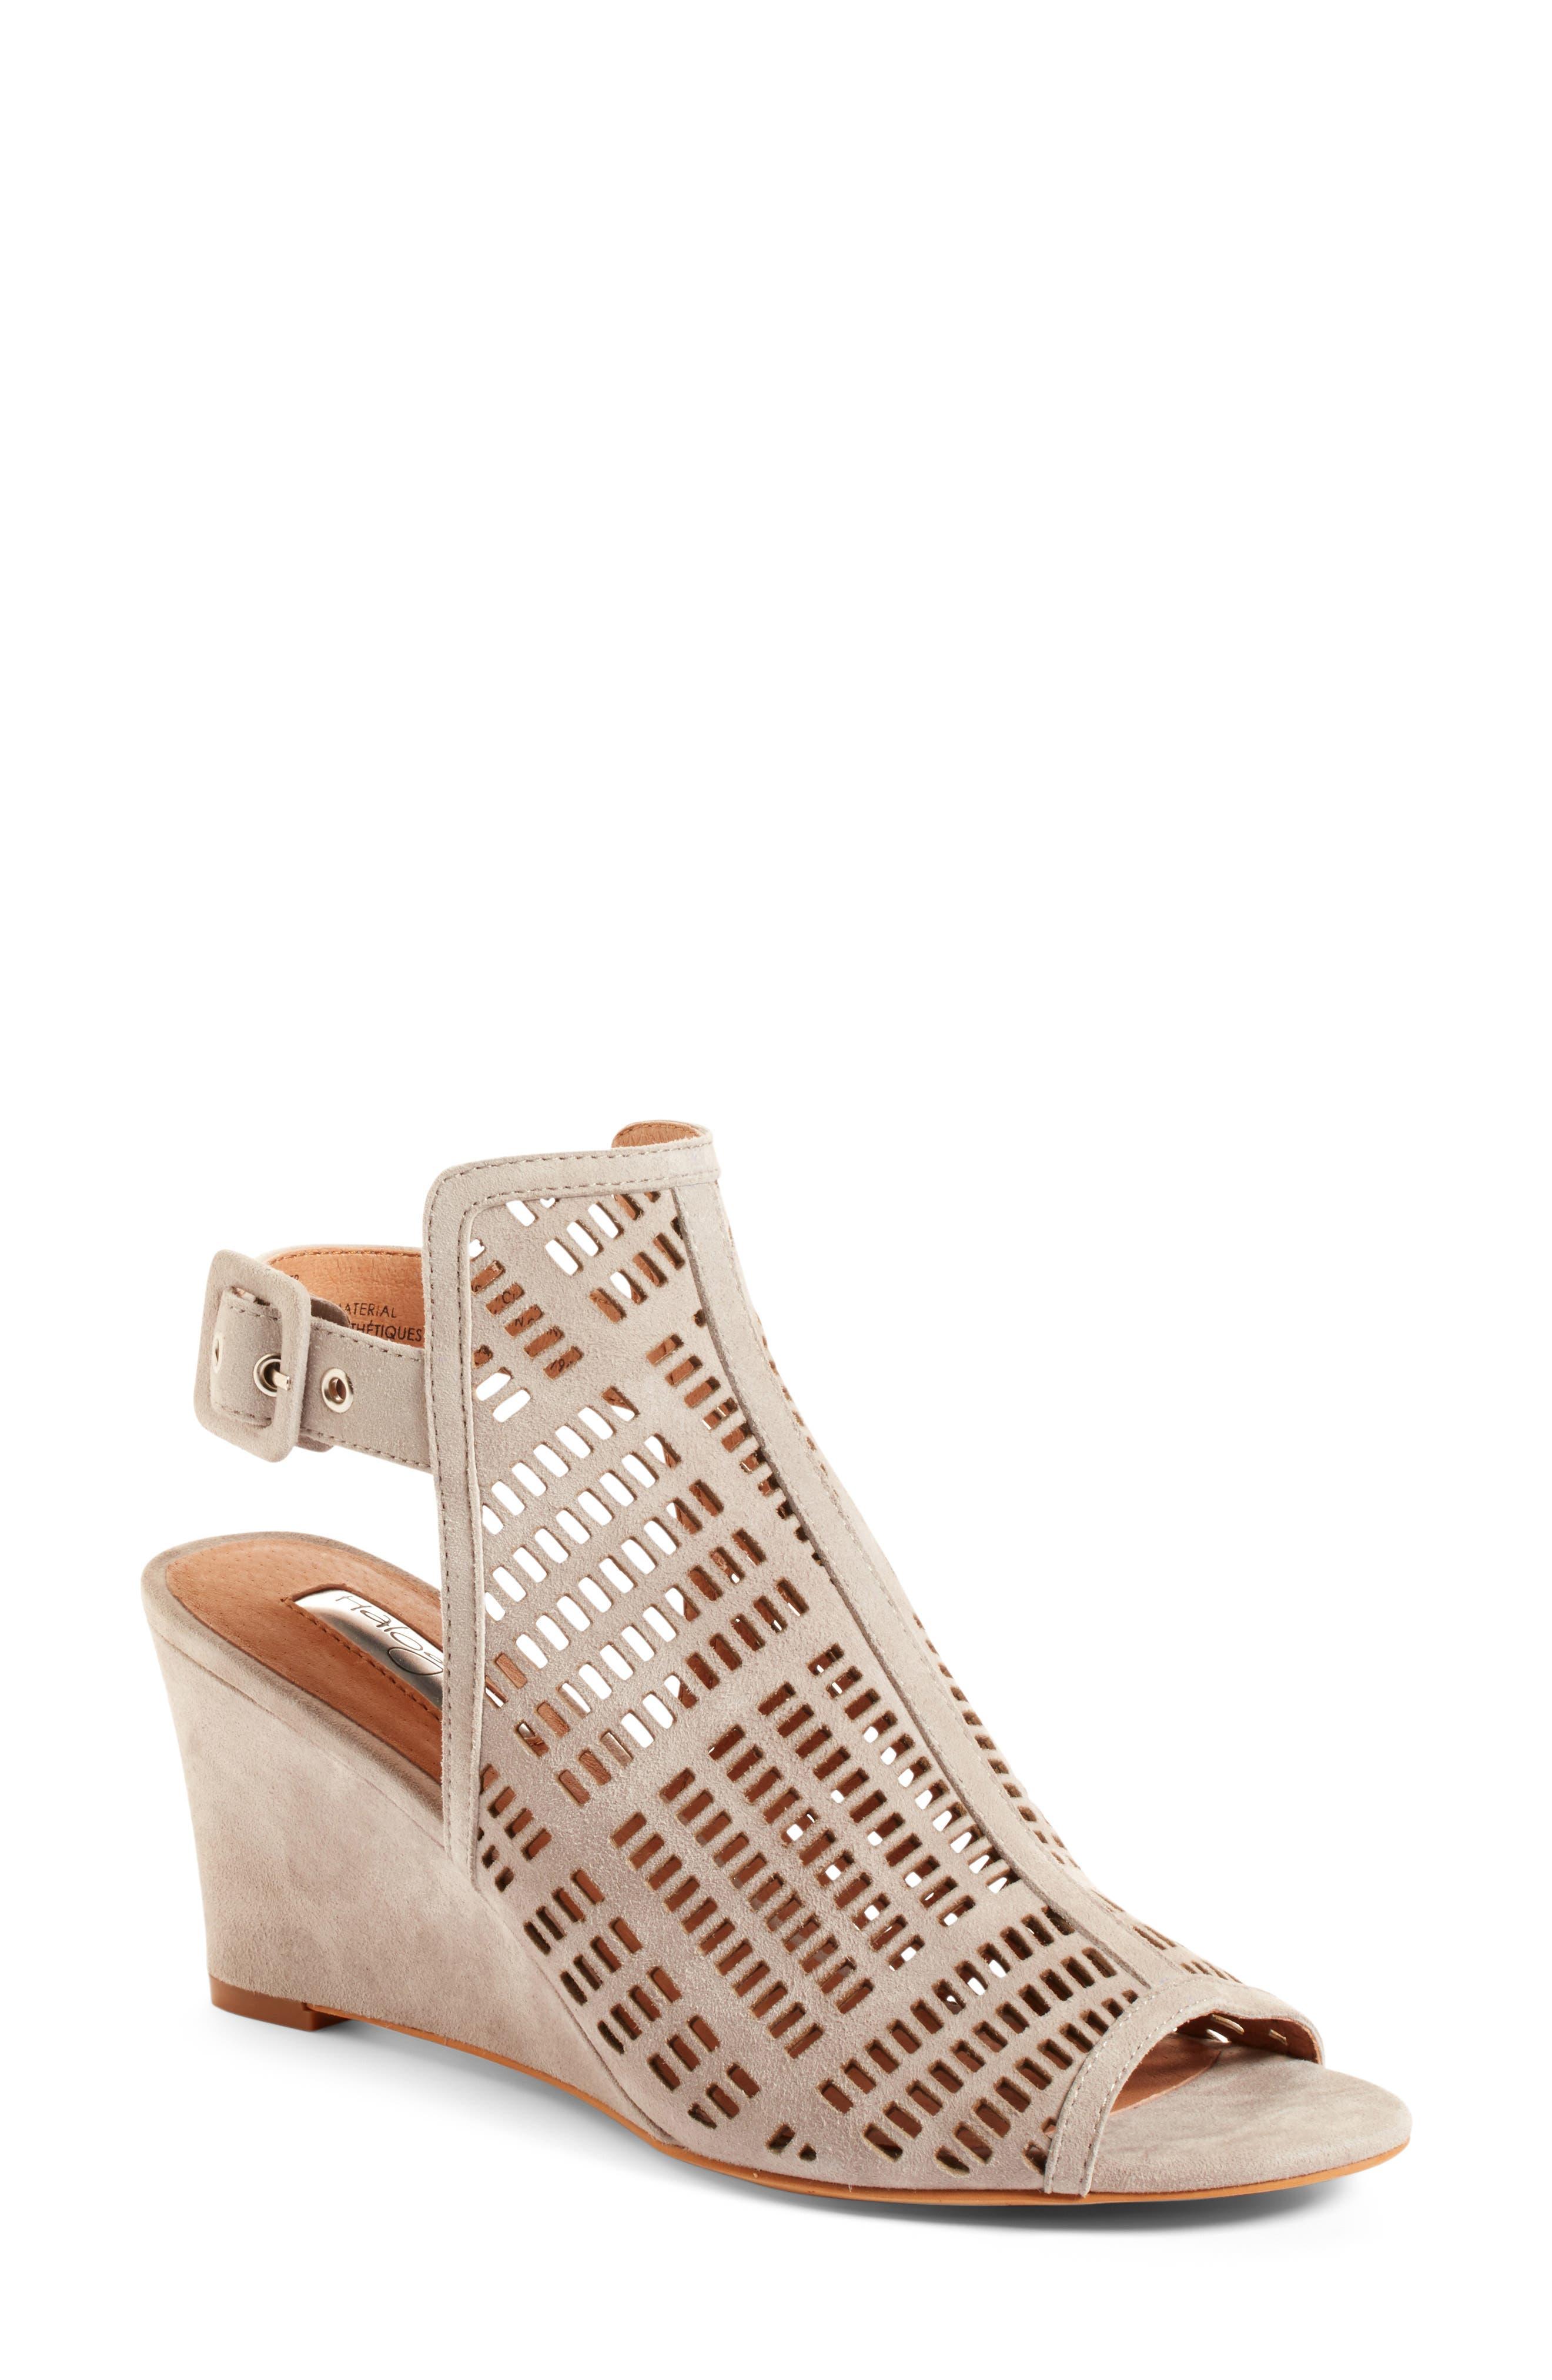 Alternate Image 1 Selected - Halogen® Rosina Laser Cut Wedge Sandal (Women)